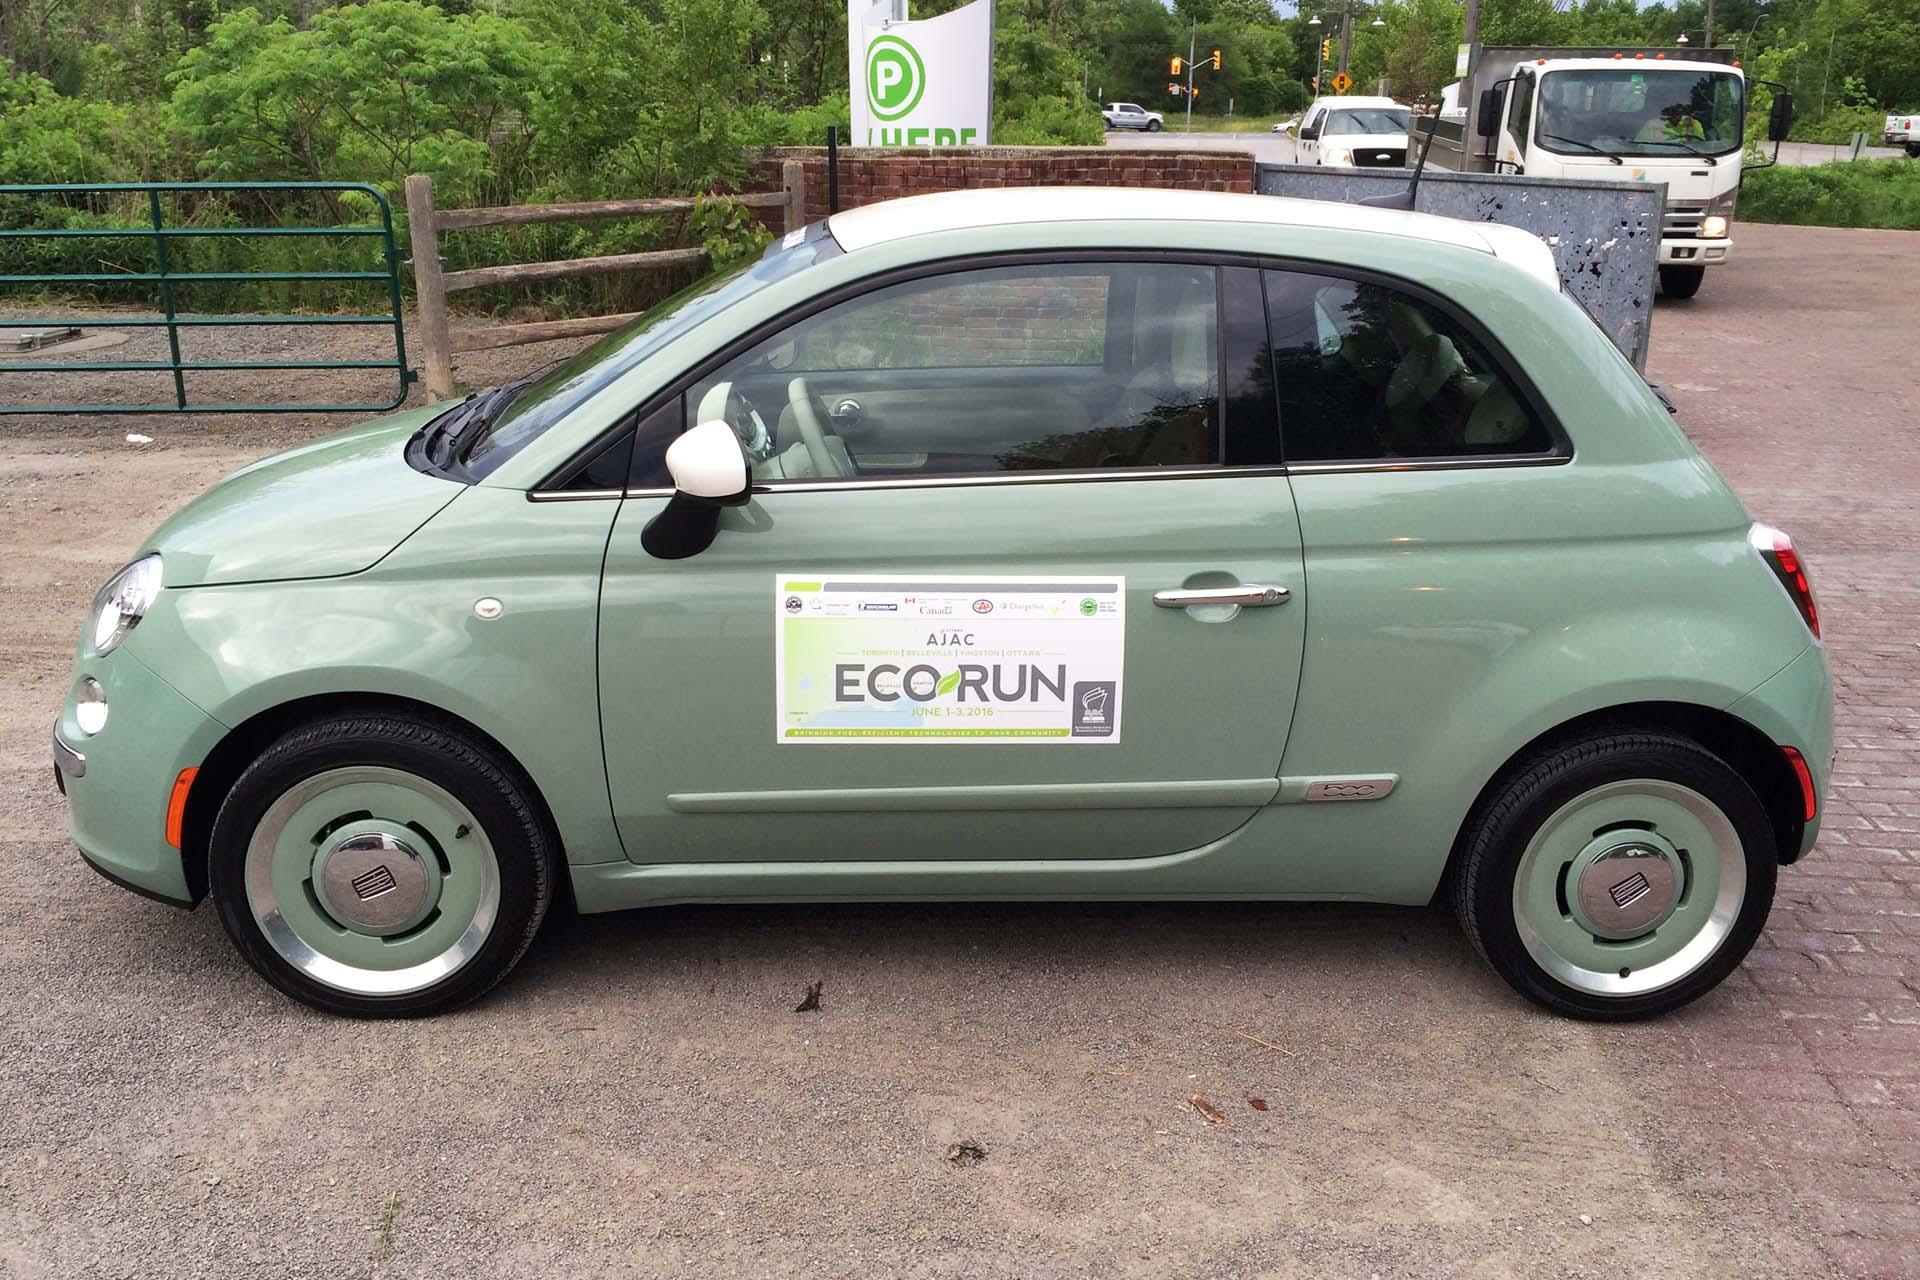 2016 AJAC Eco-Run